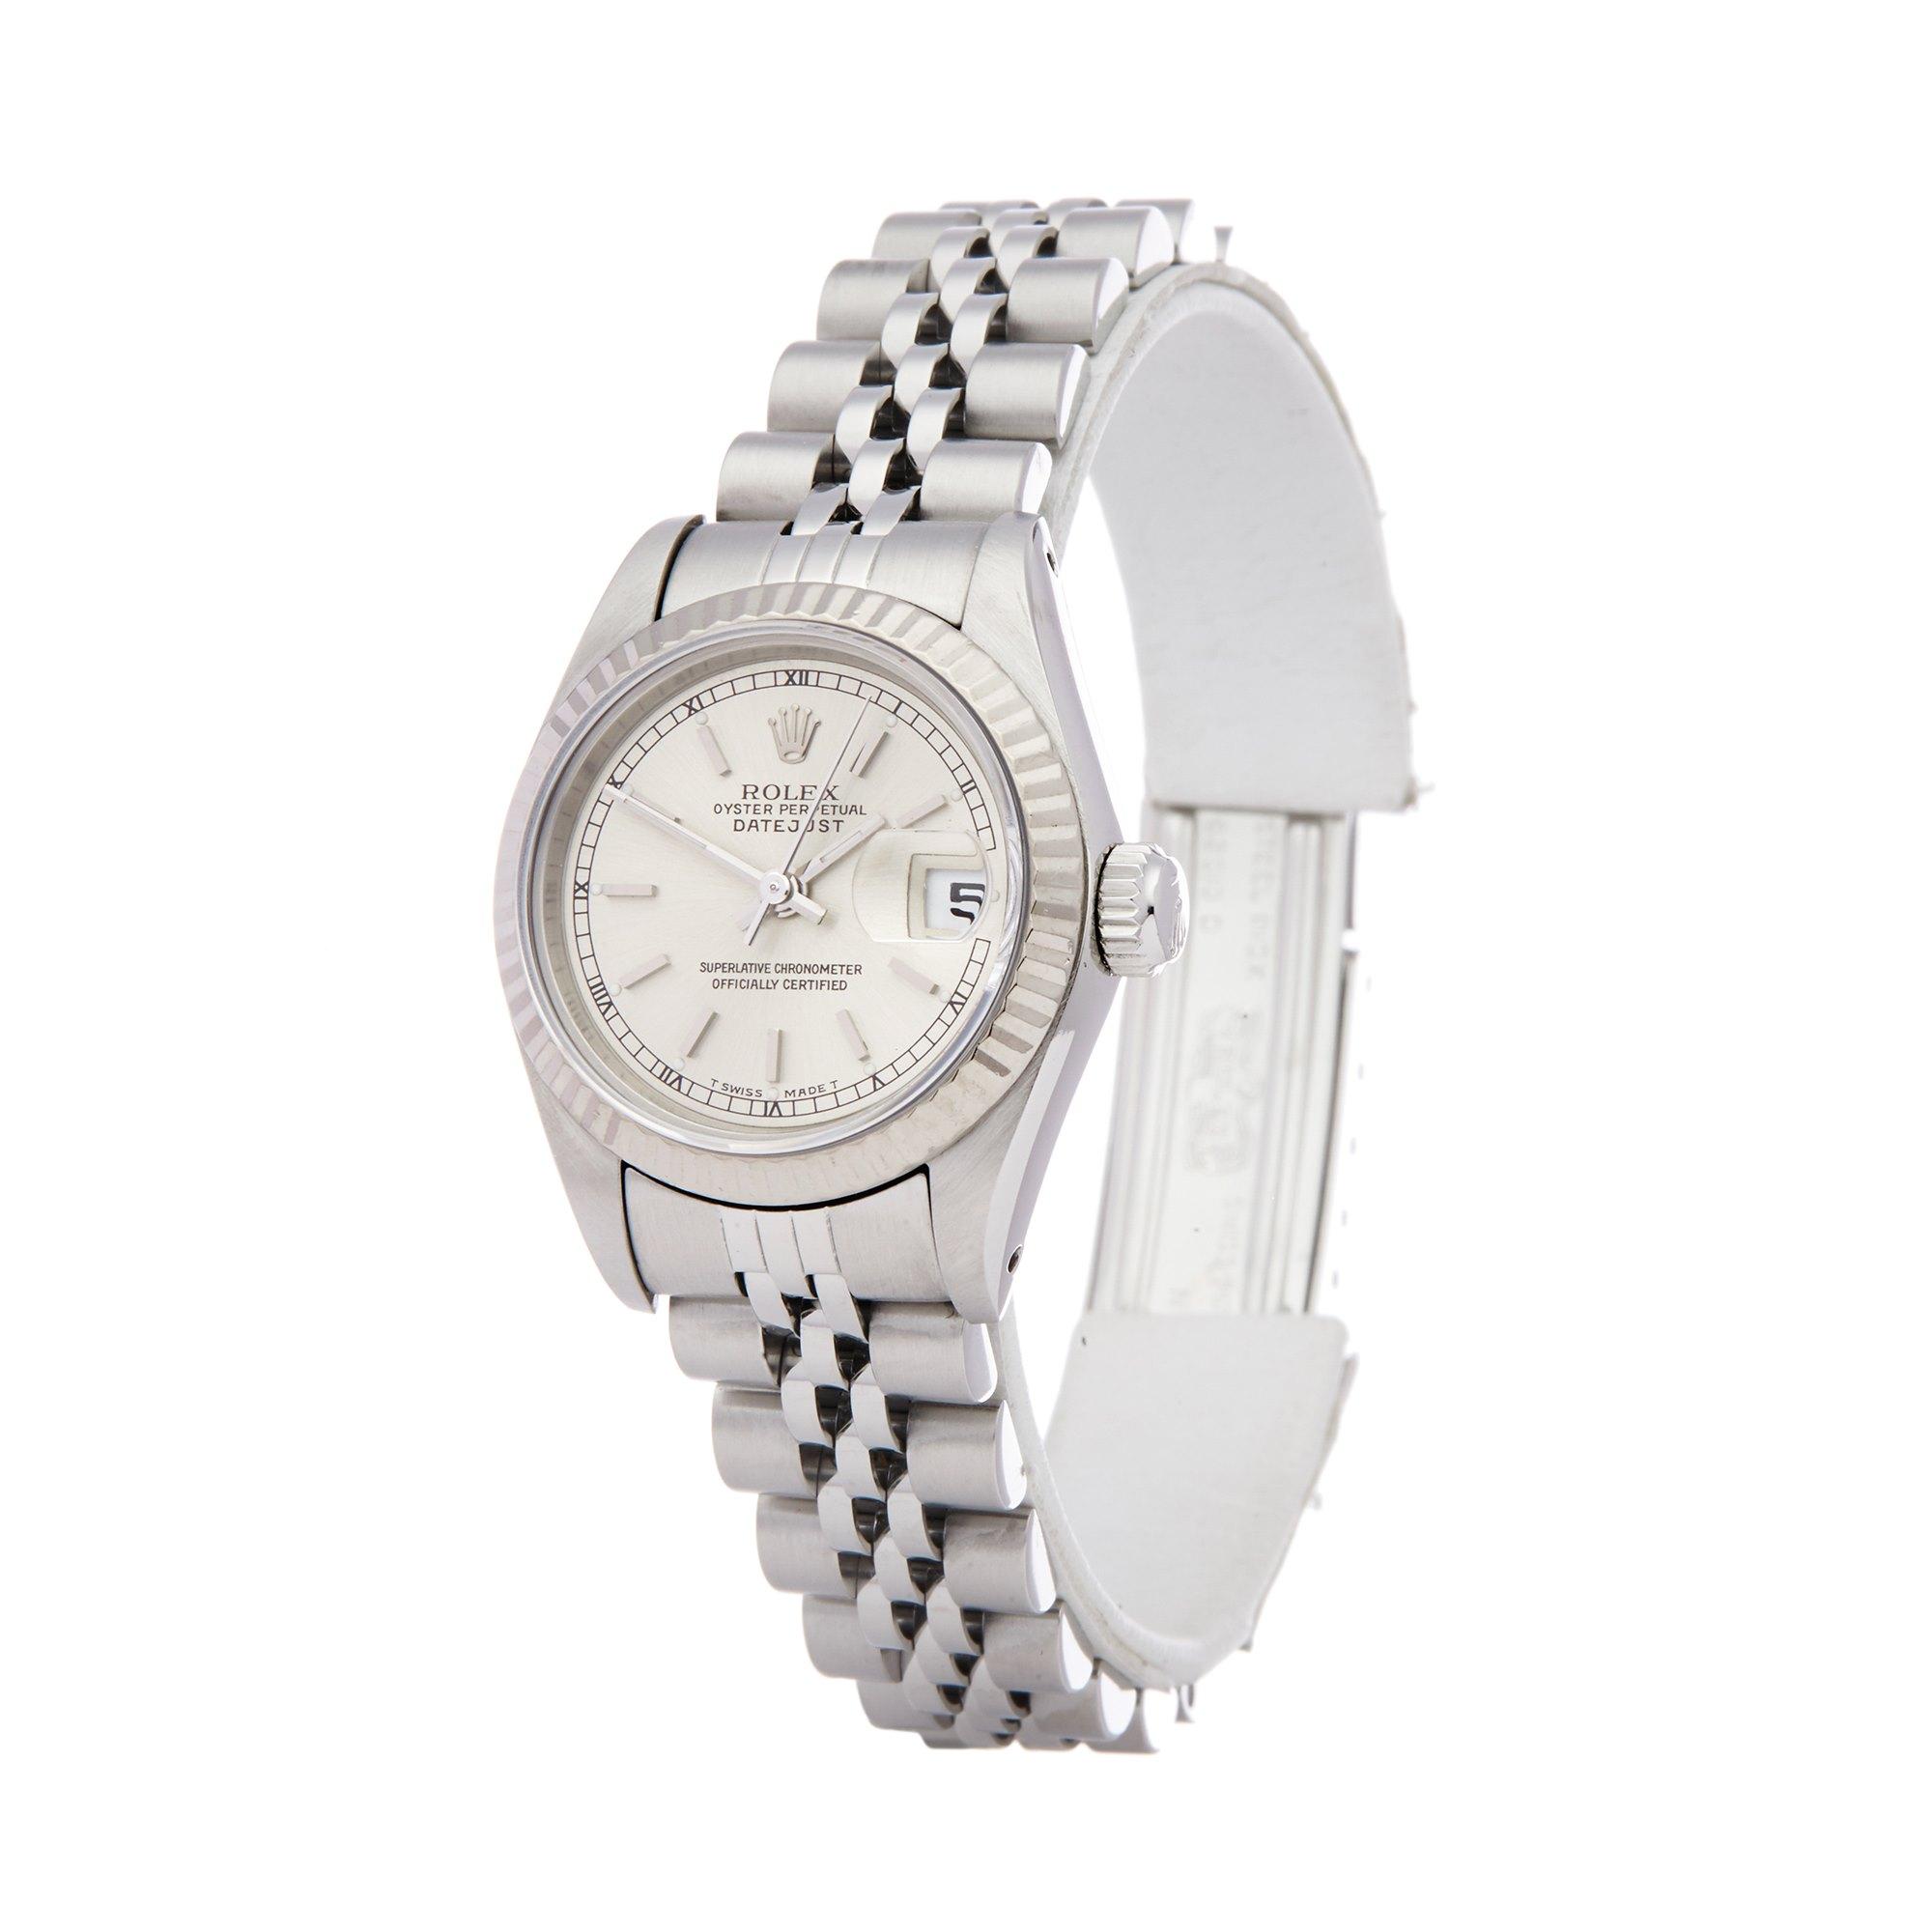 Rolex Datejust 26 Stainless Steel 69174